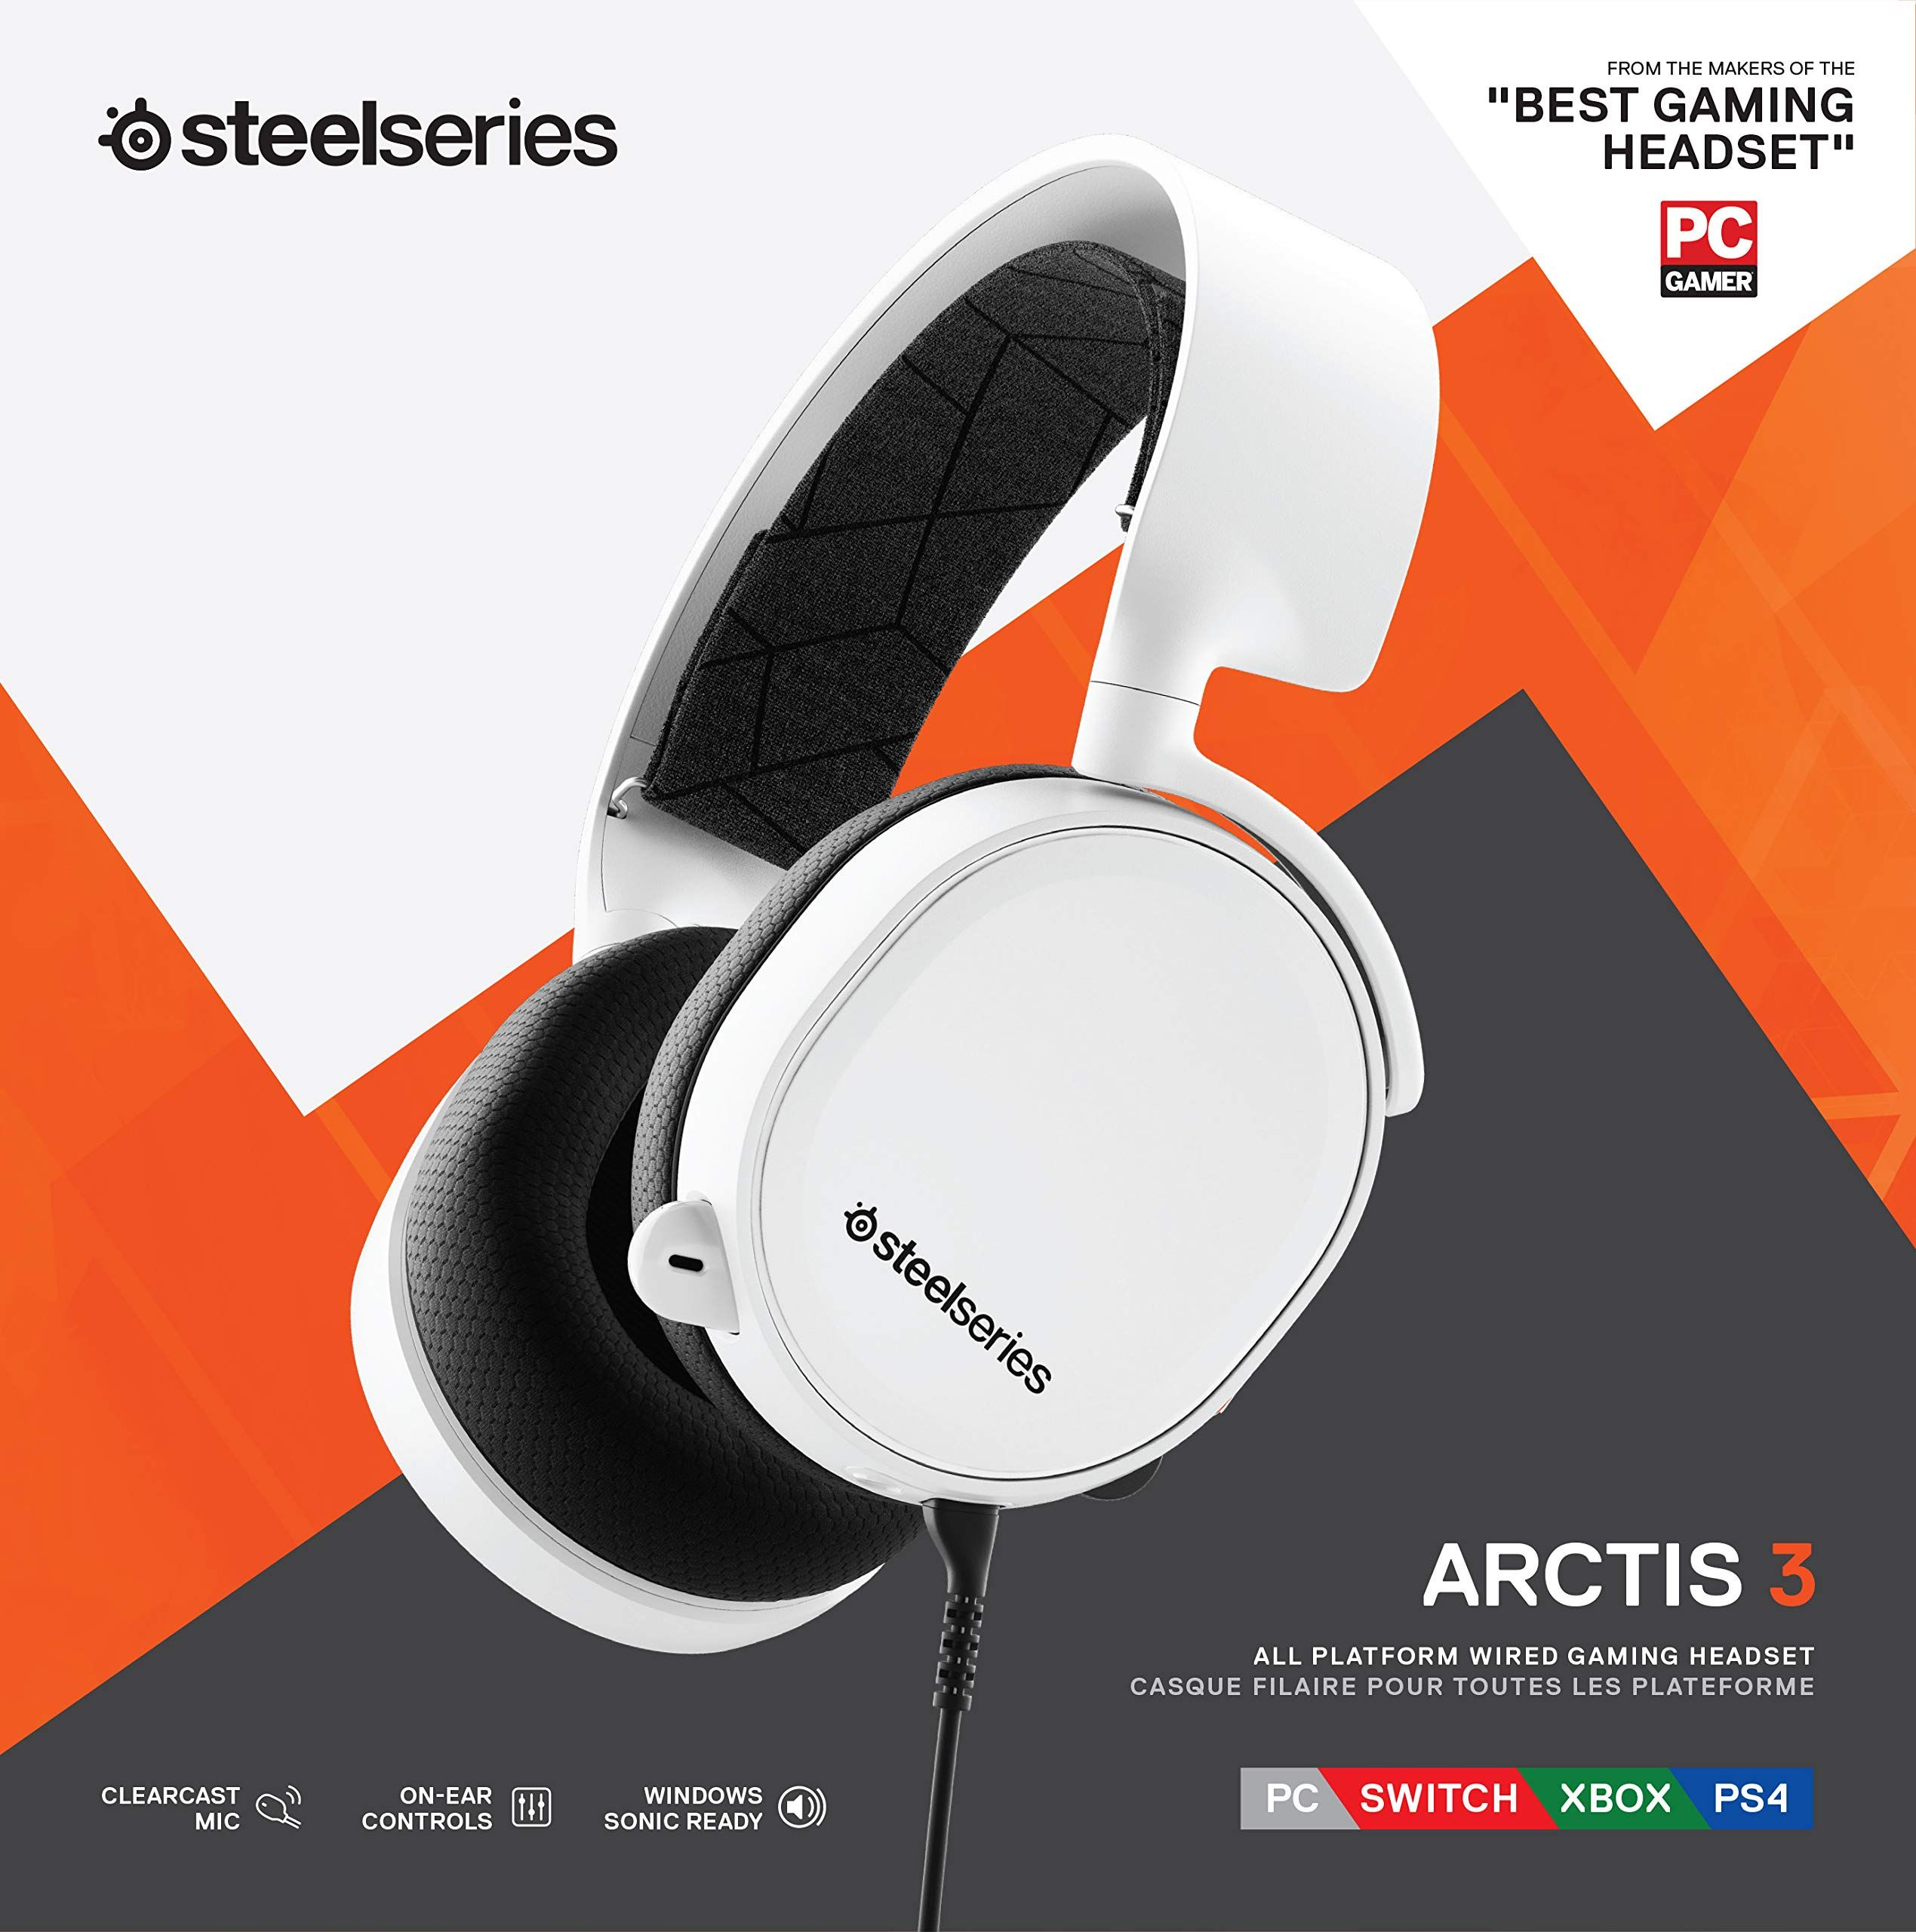 SteelSeries Arctis 3 (2019 Edition) AllPlatform Gaming